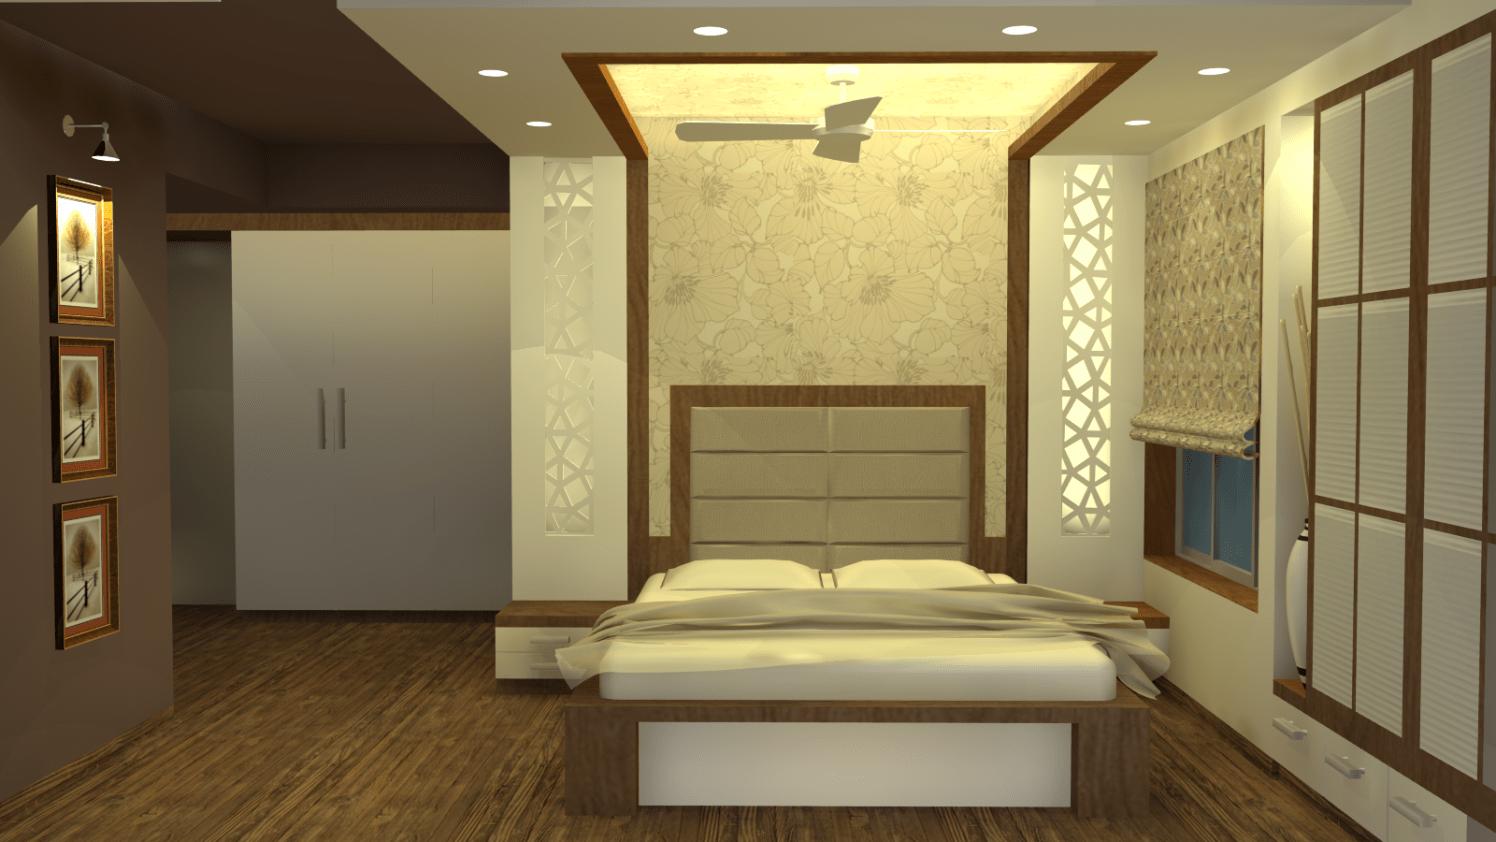 Contemporary Bedroom by Sunil Sathe Contemporary | Interior Design Photos & Ideas